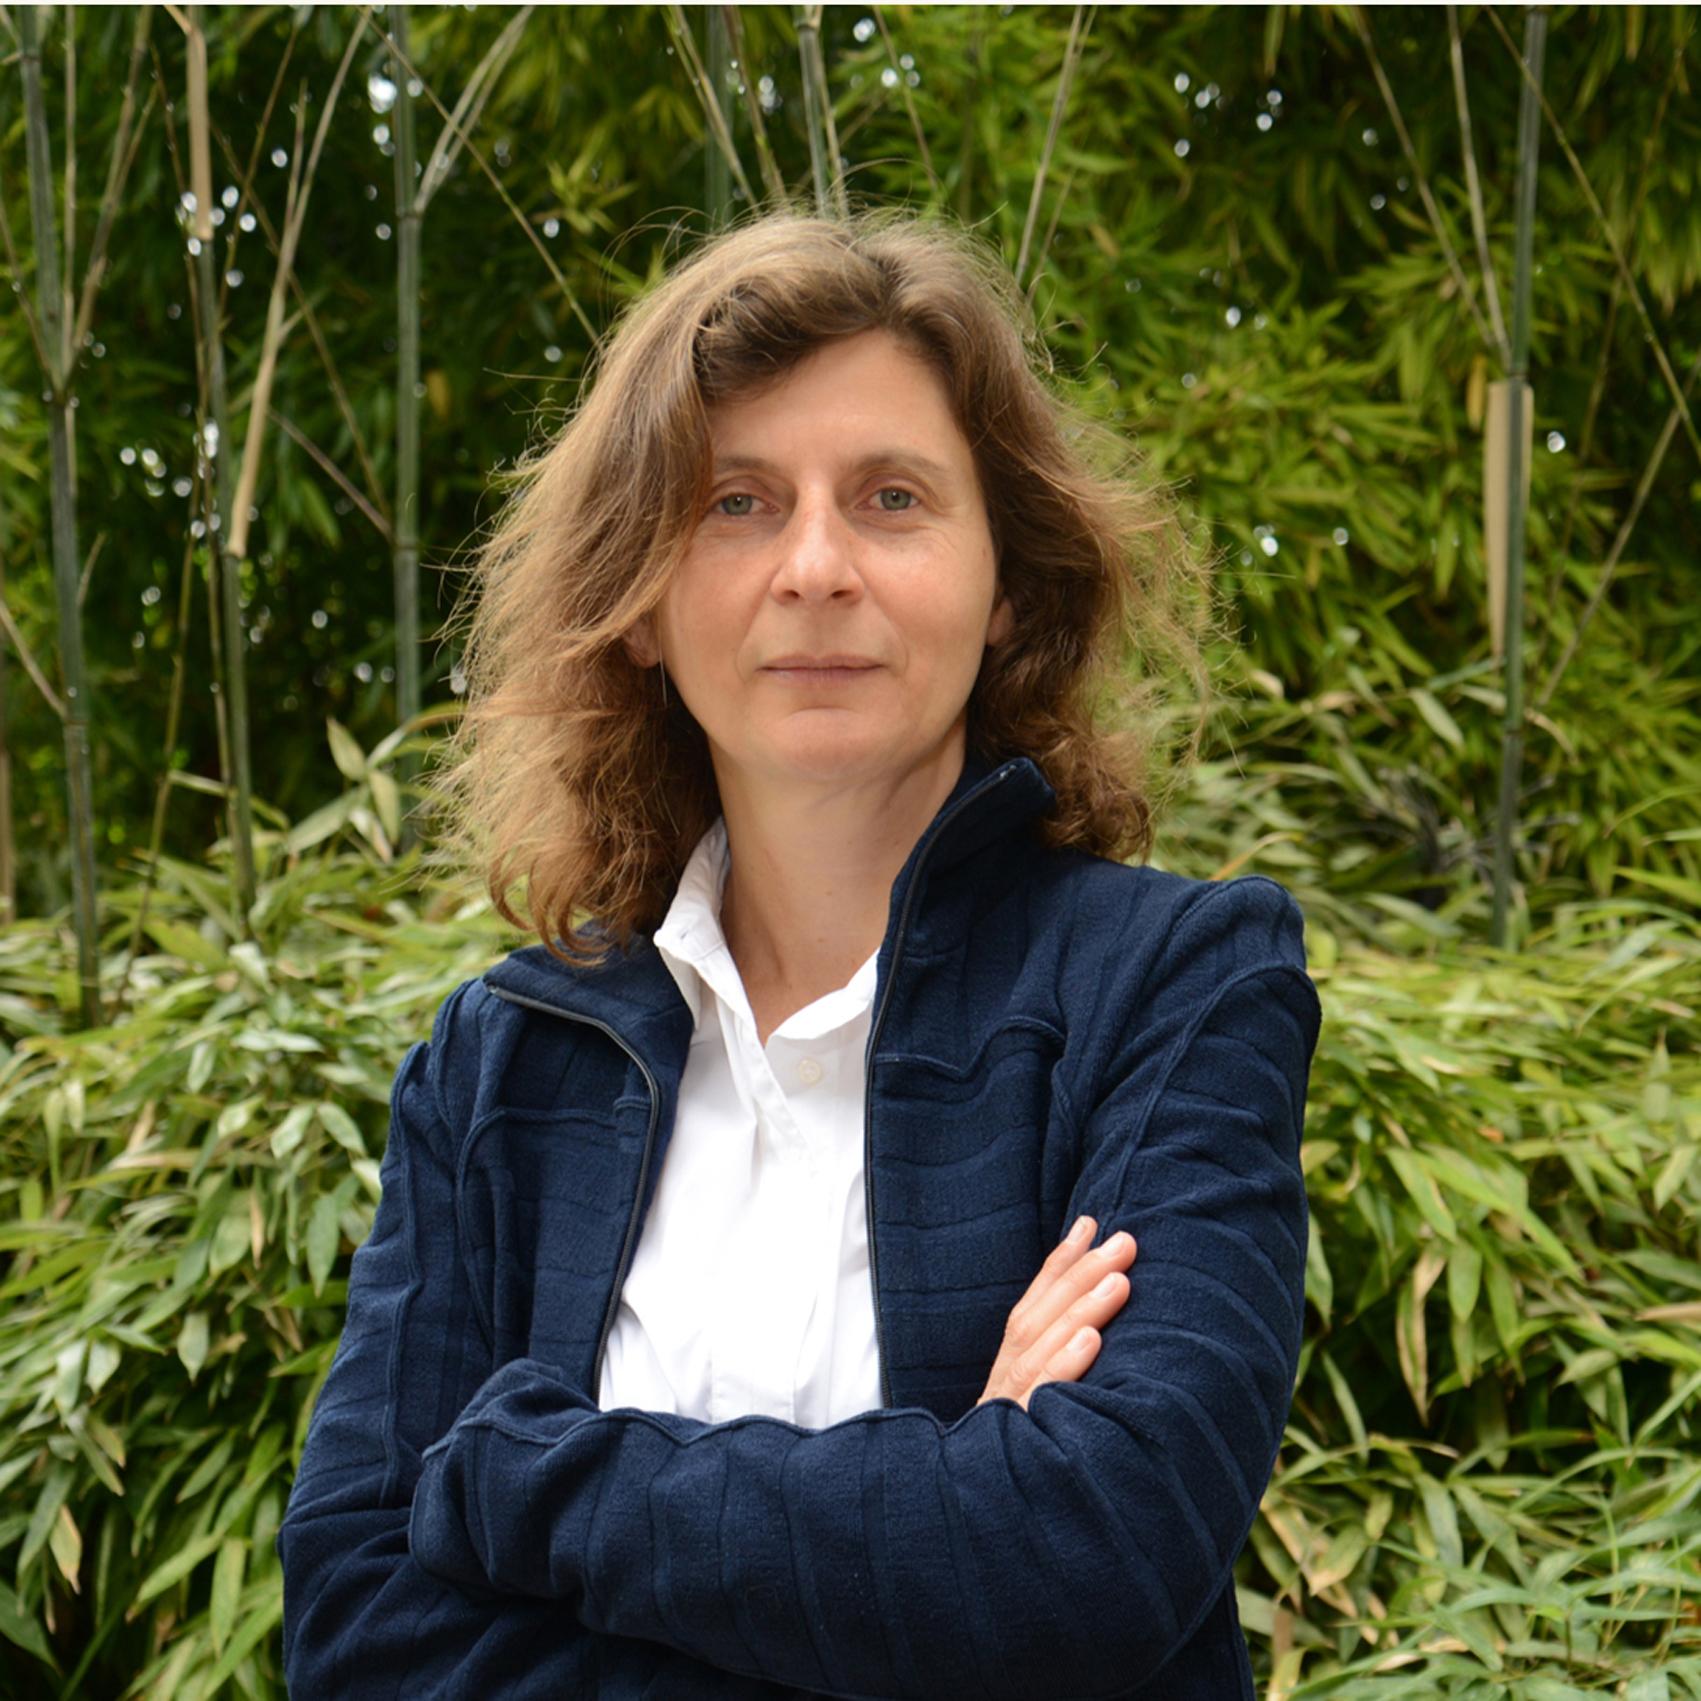 Olivia Rosenthal Photo C. Hélie © Gallimard